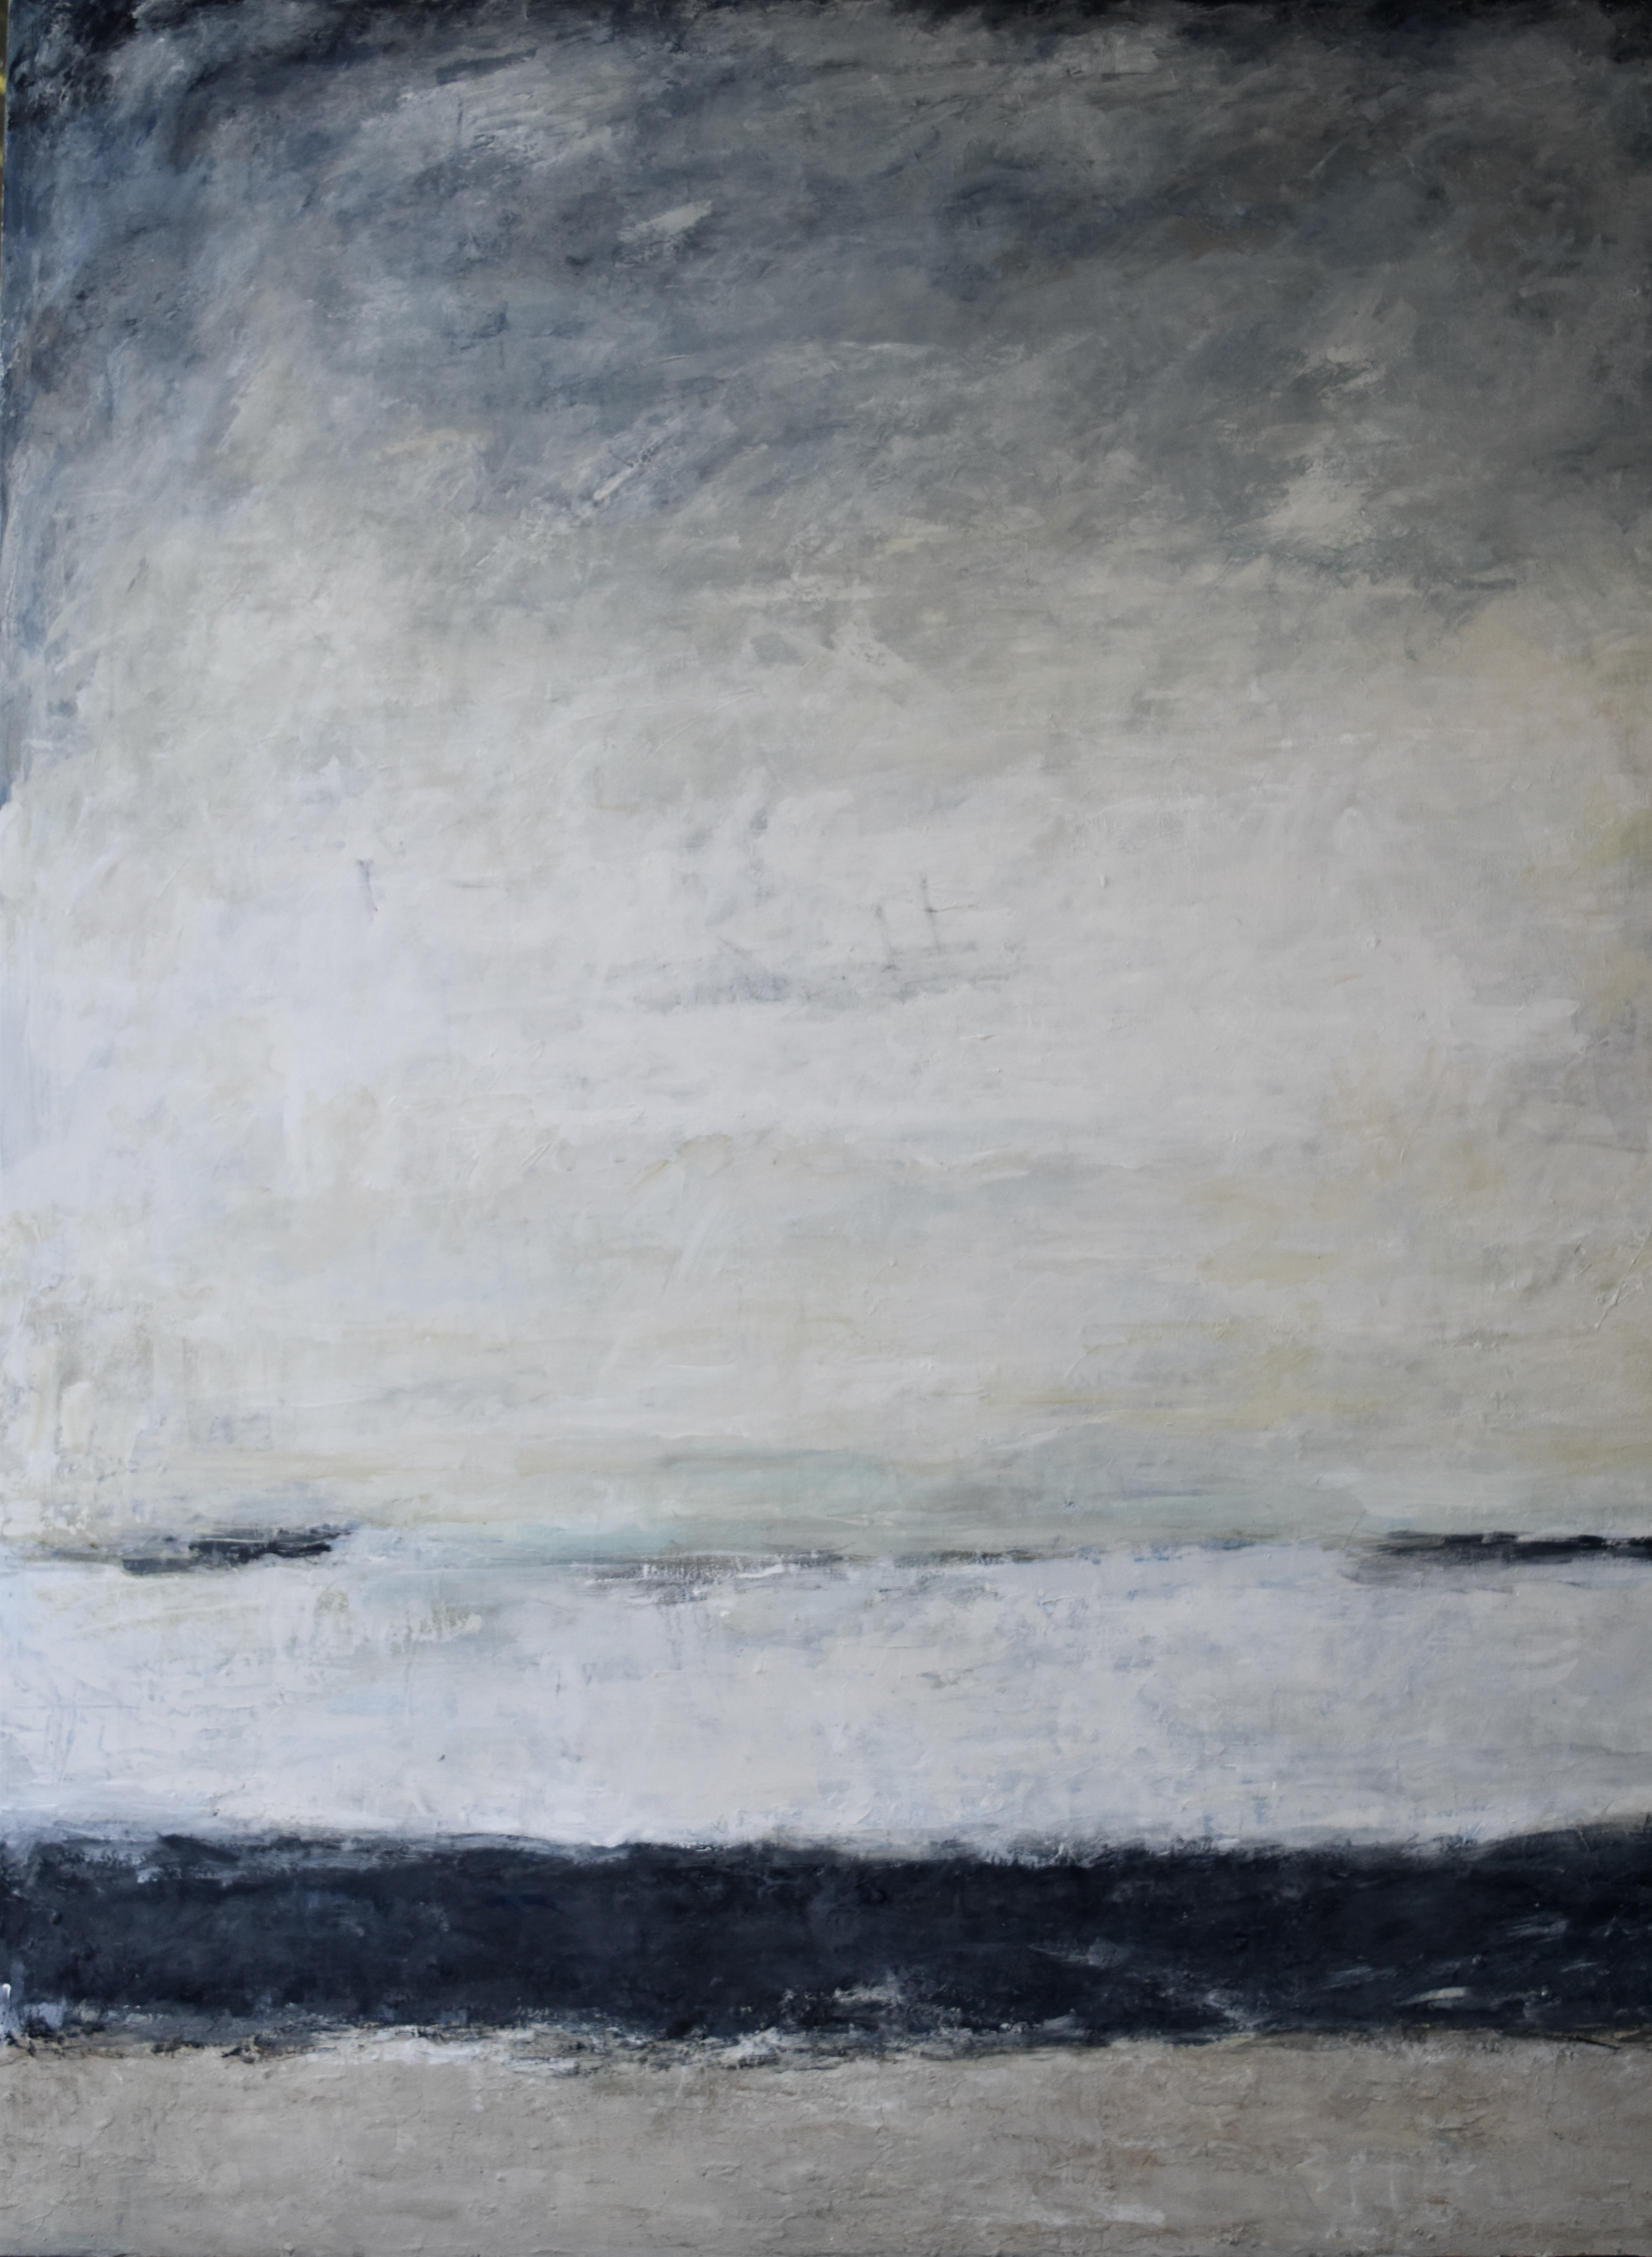 """Sea change on the horizon""46x60"""